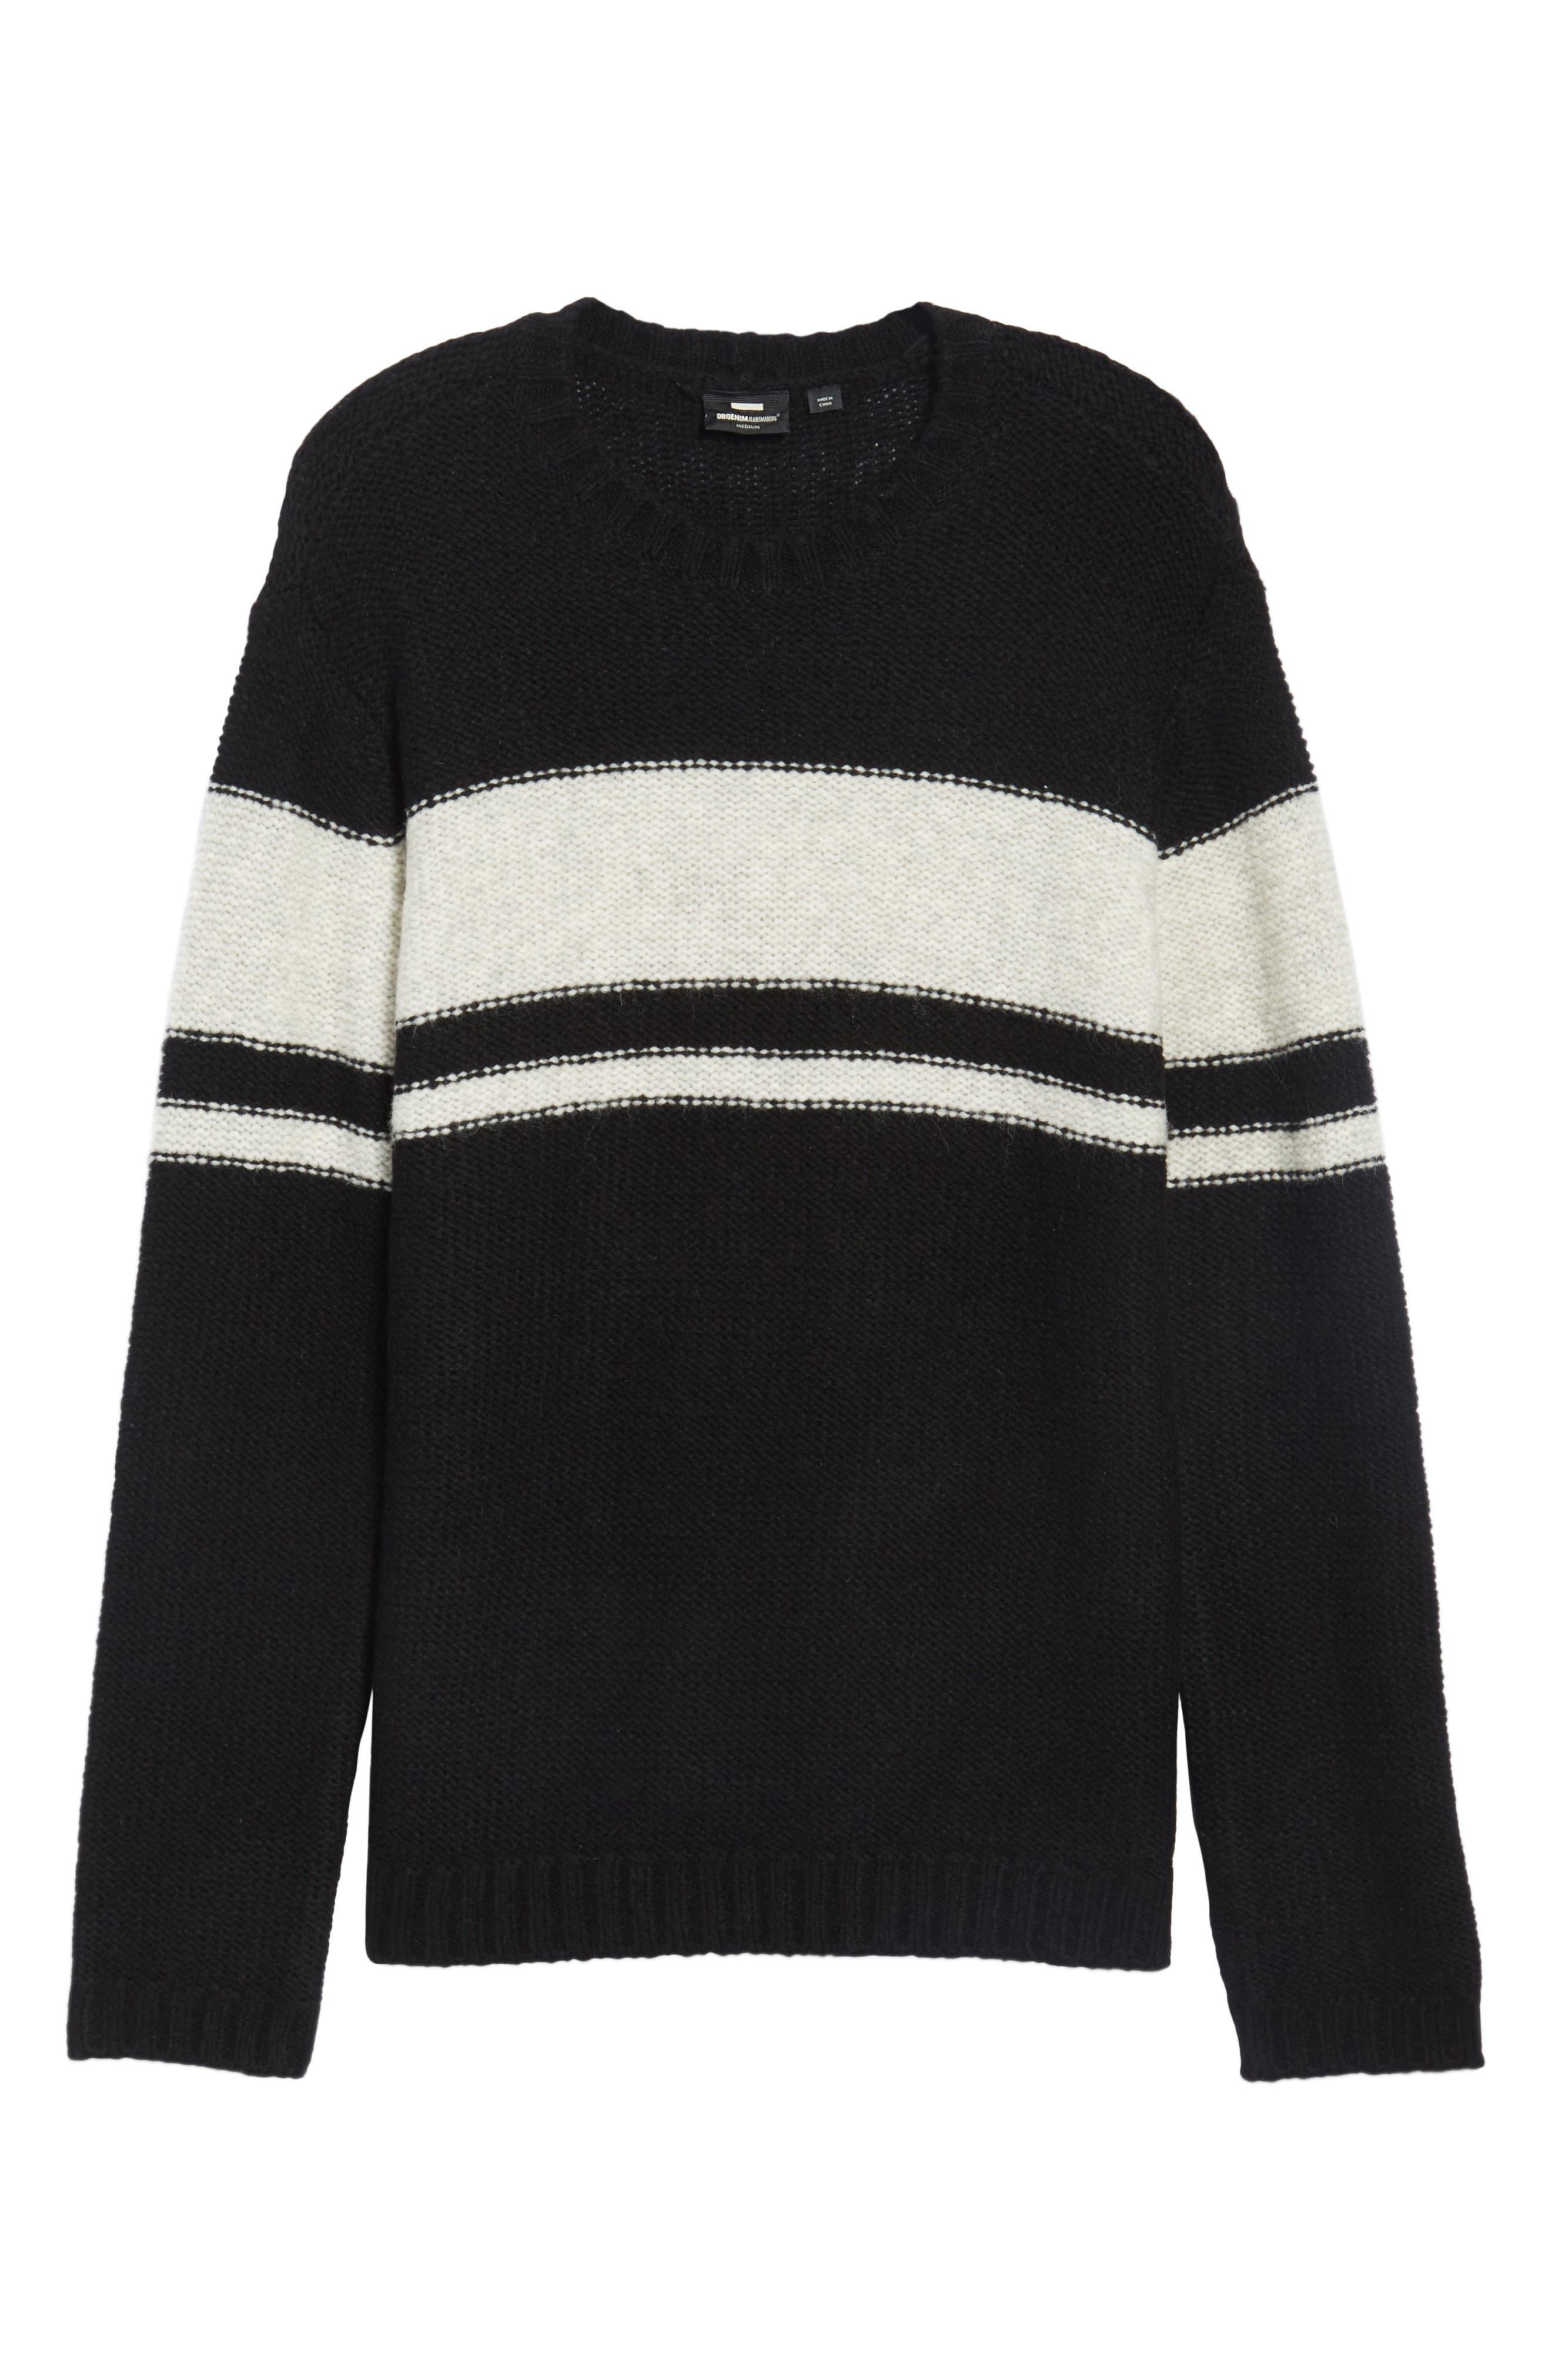 Blume Sweater,                             Alternate thumbnail 6, color,                             001